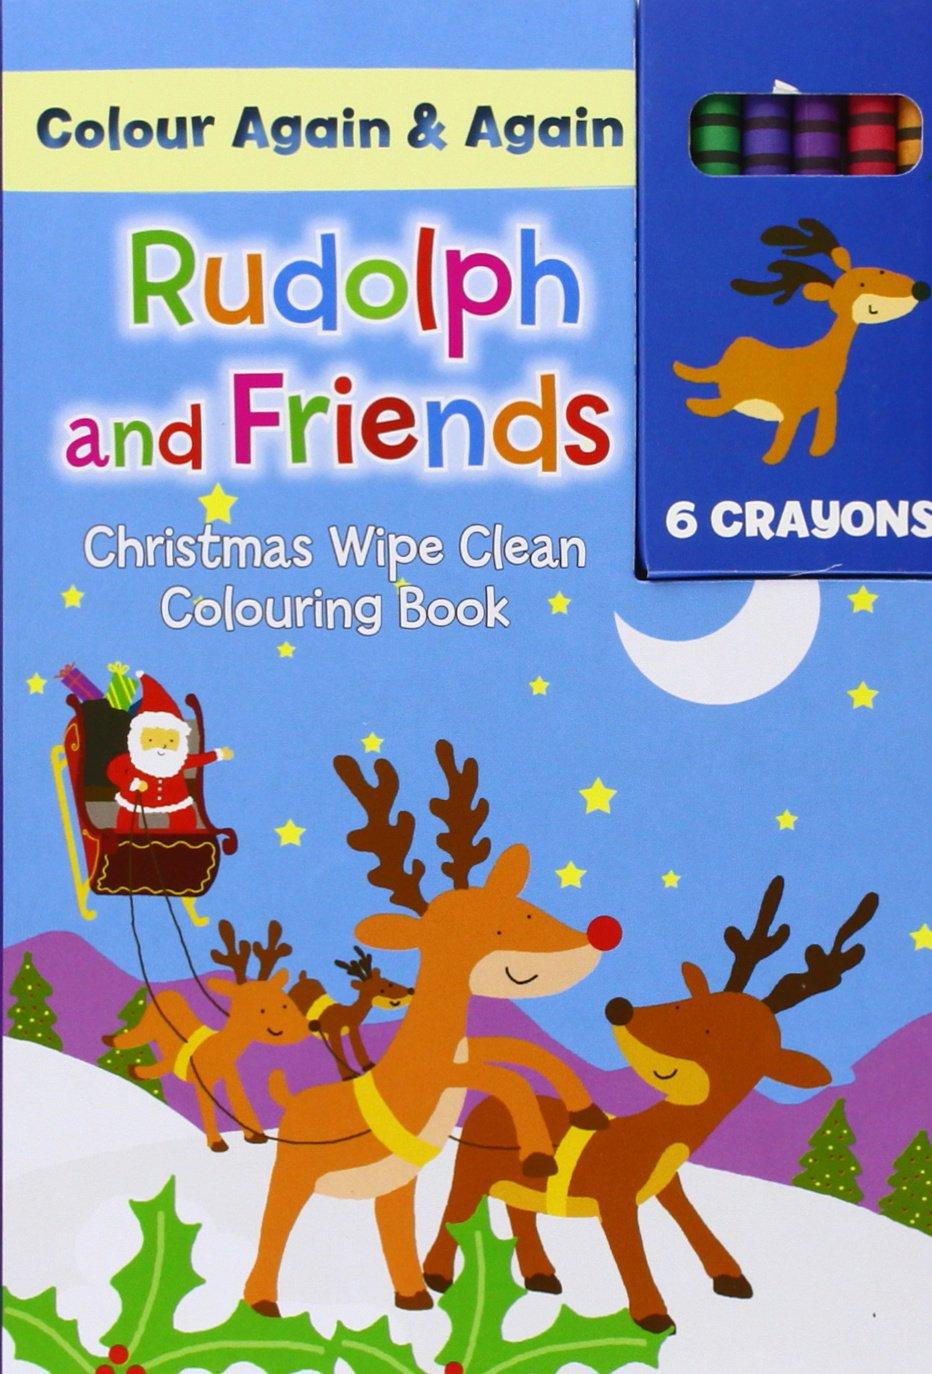 Download Christmas Colour Me Again & Again - Rudolph & Friends: Colouring & Activity ebook